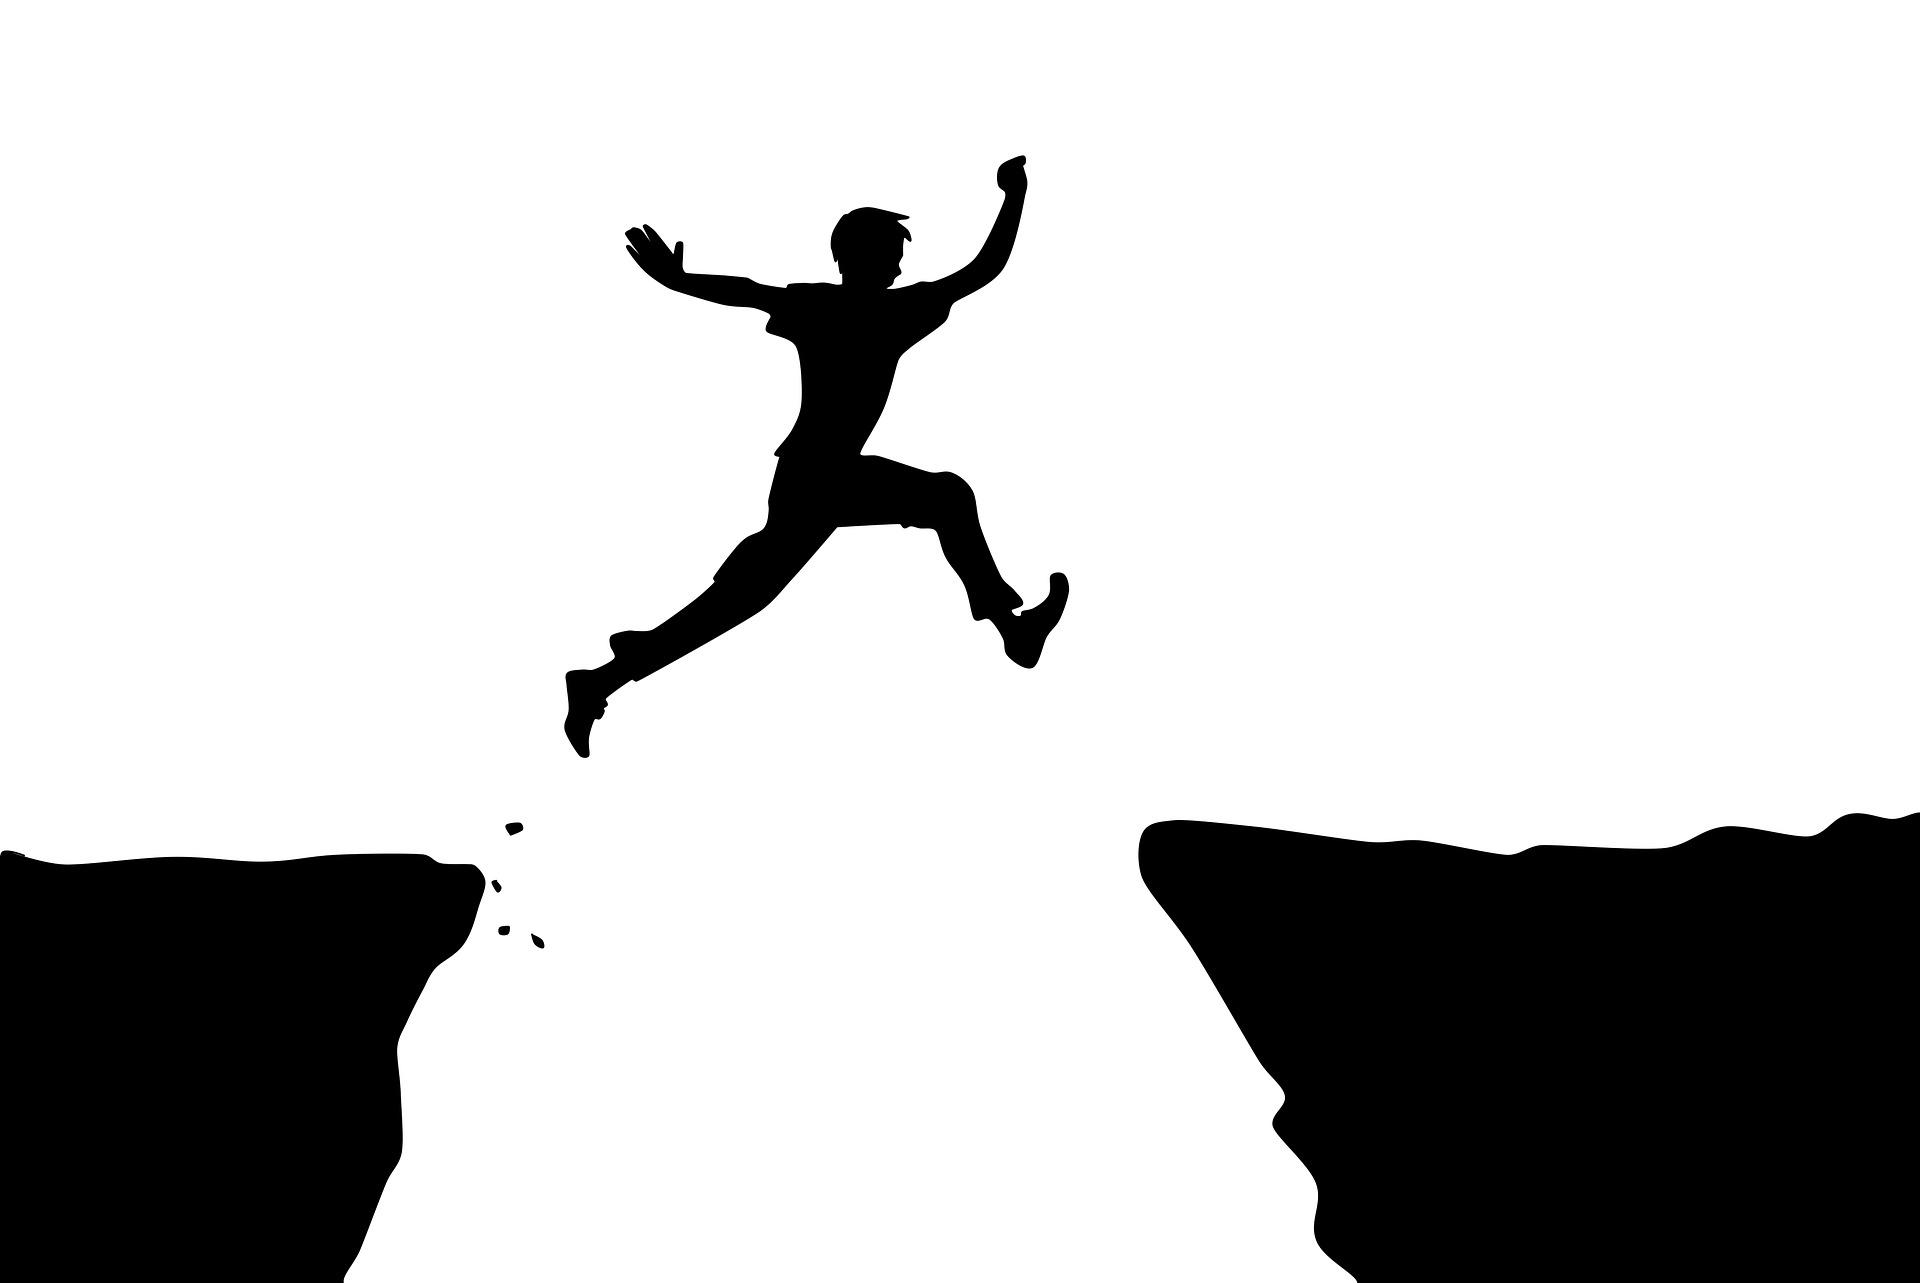 Actitud optimista - como lograrlo